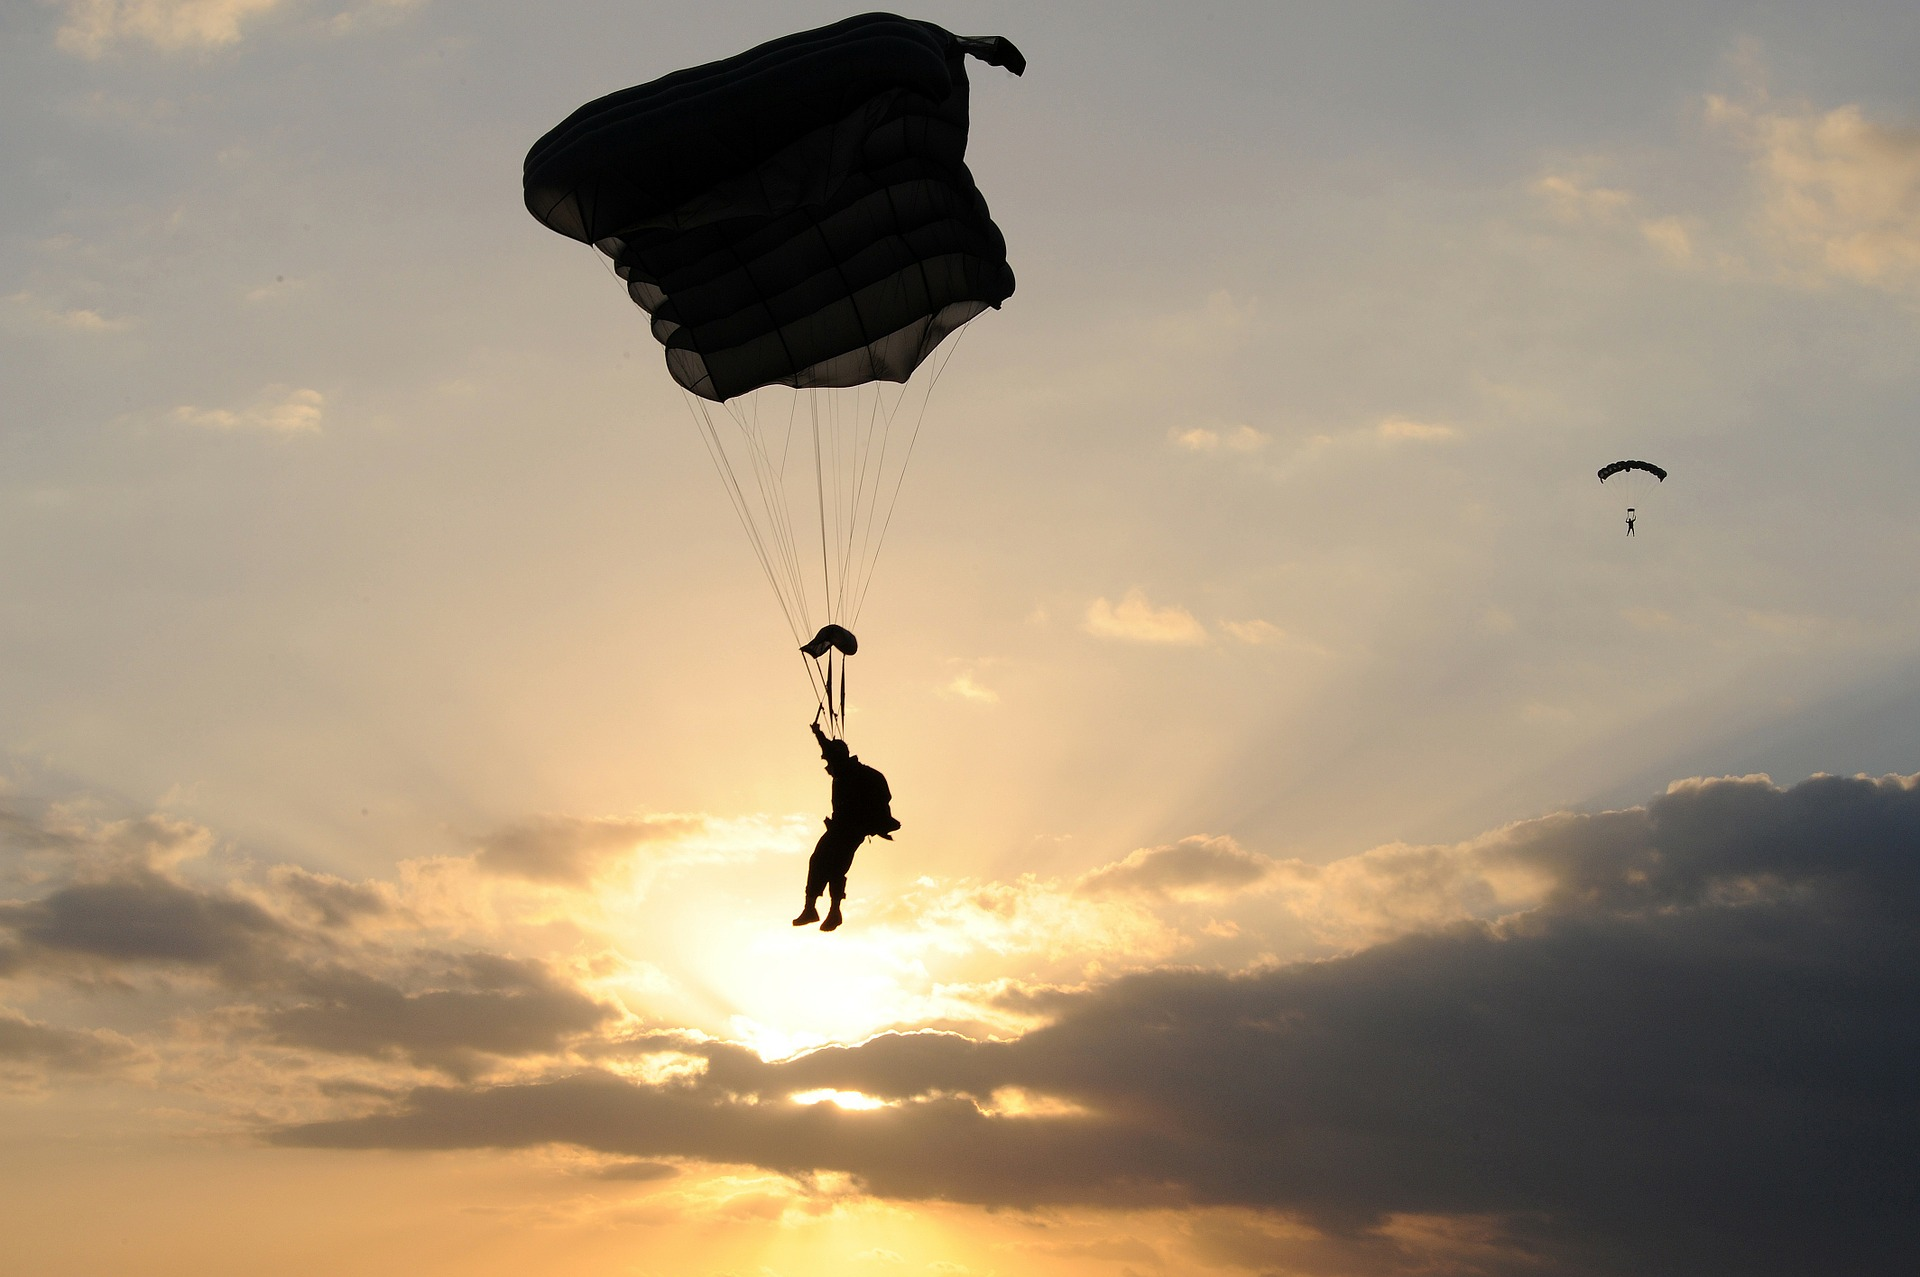 parachute-80088_1920